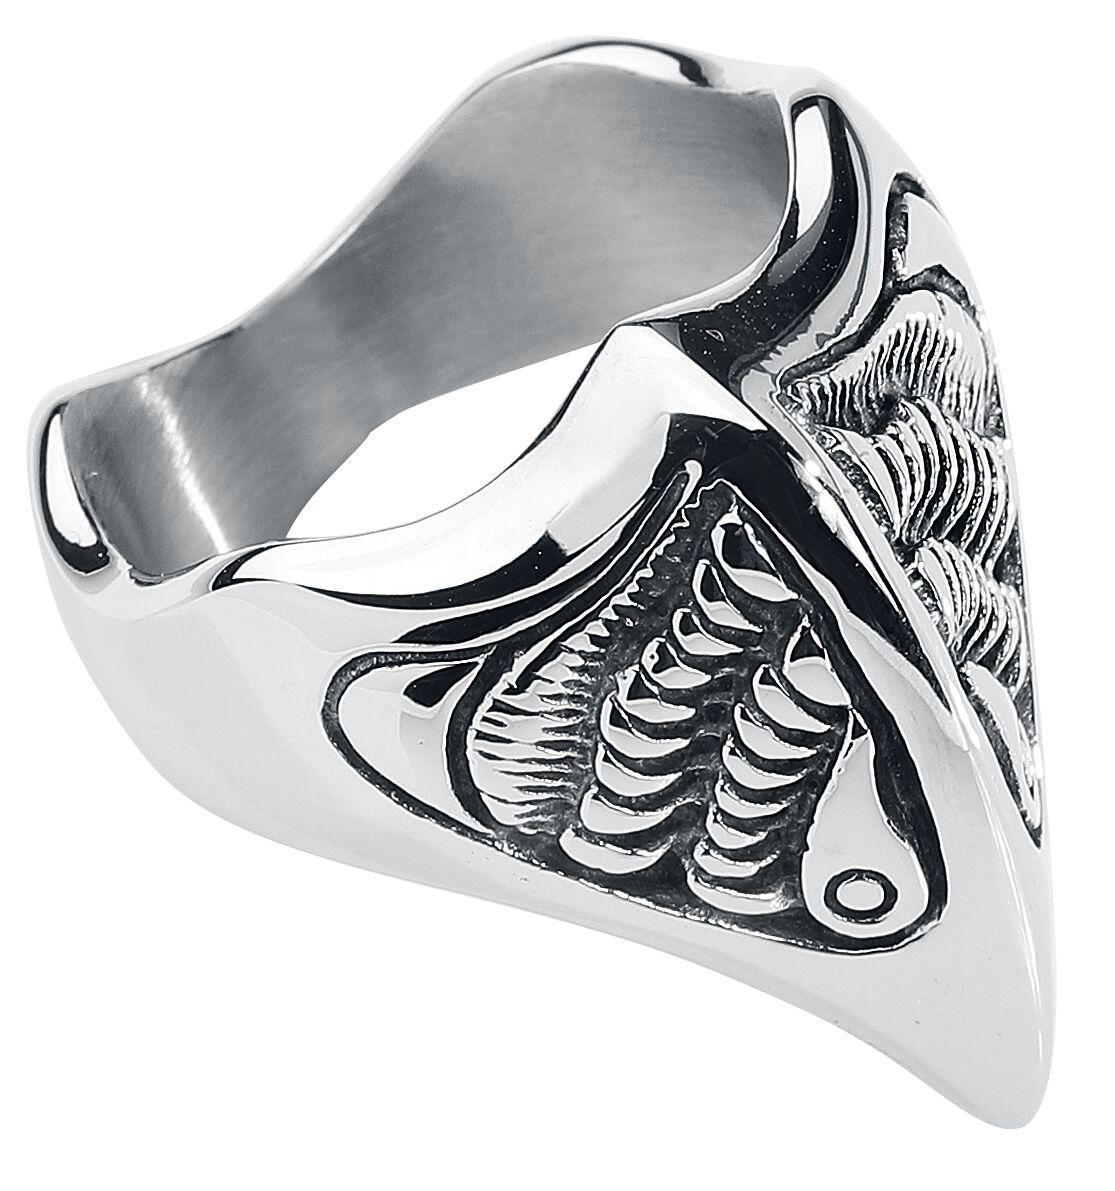 Basics - Pierścienie - Pierścień etNox Hard and Heavy Eagle Head Pierścień srebrny - 352587